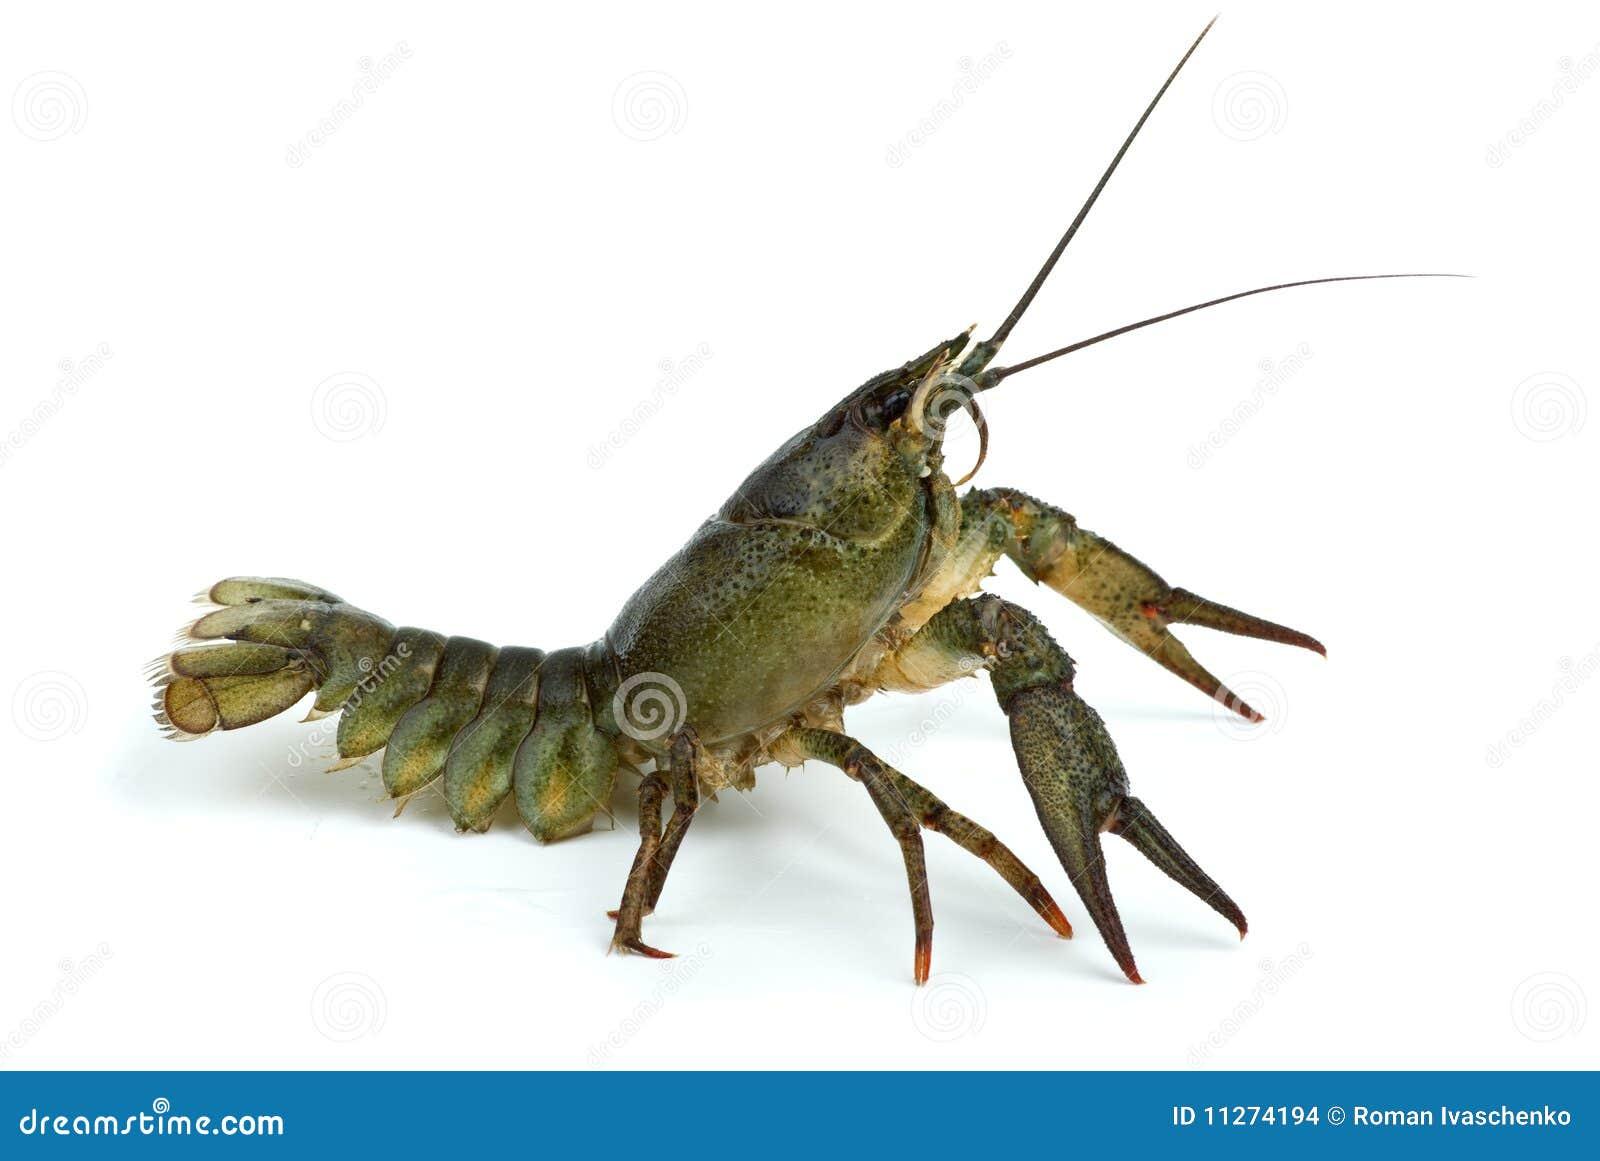 Crawfishdefensivpos.